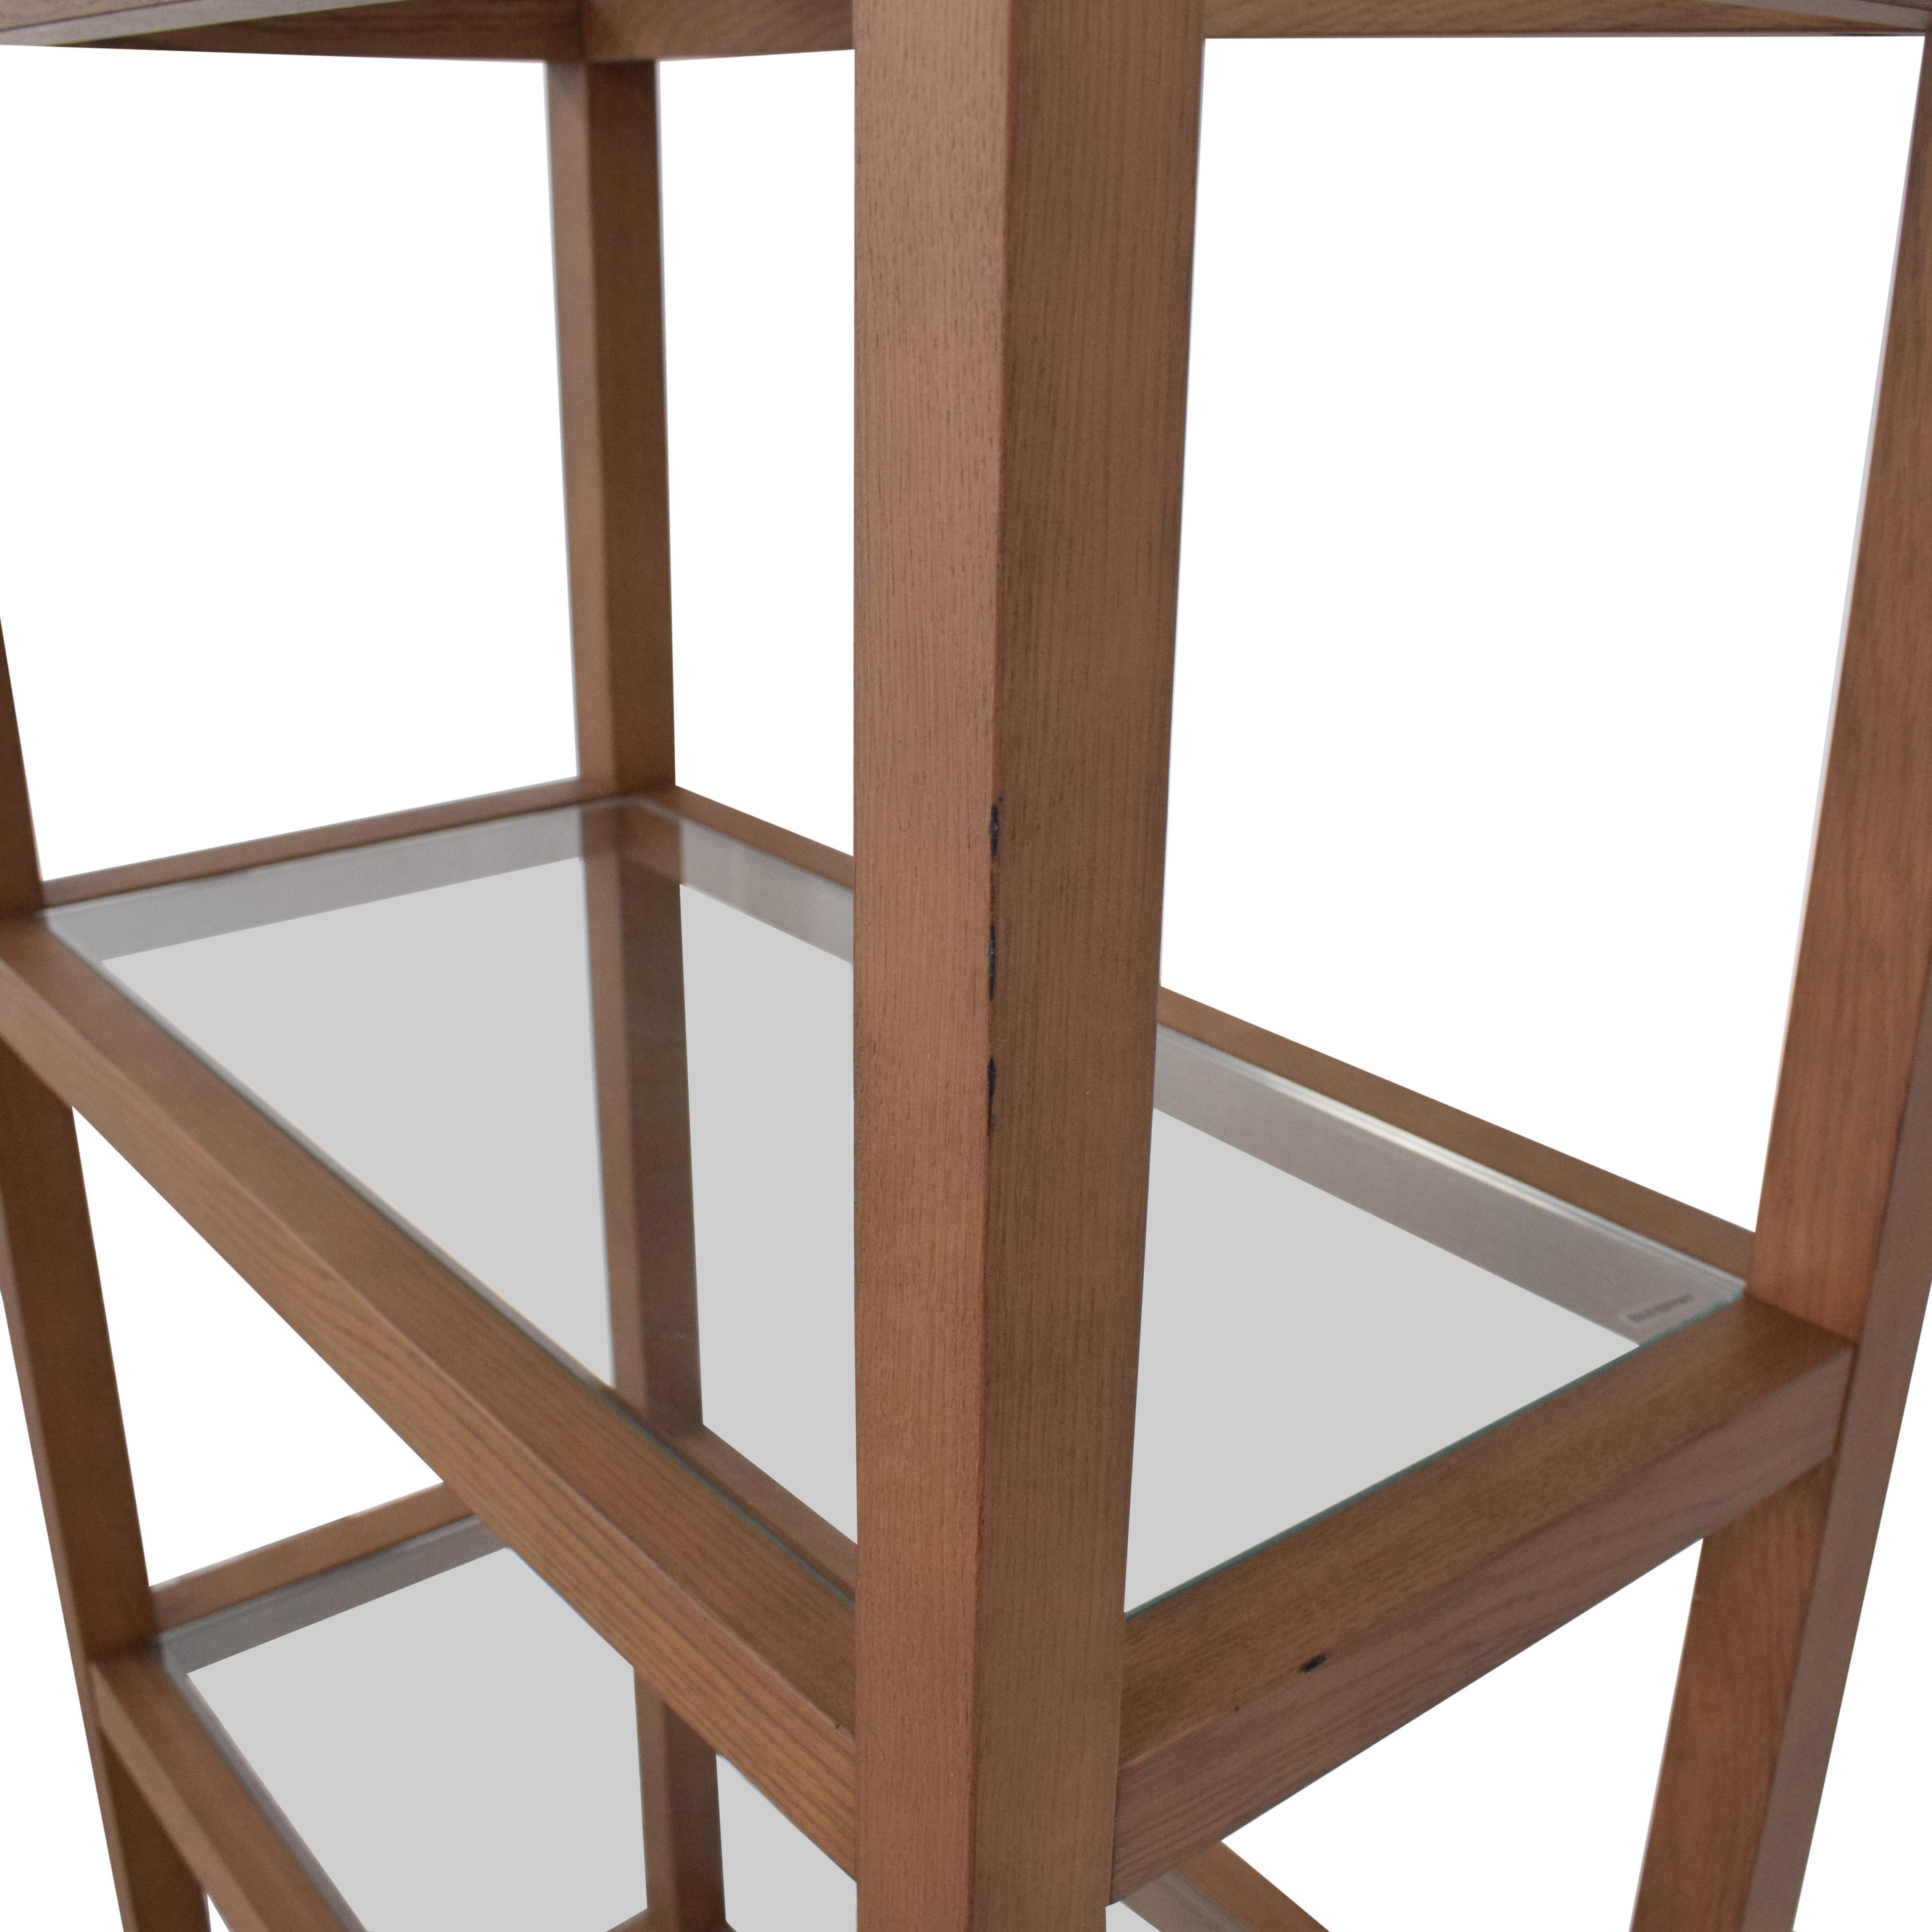 Crate & Barrel Crate & Barrel Anderson Bookcase for sale